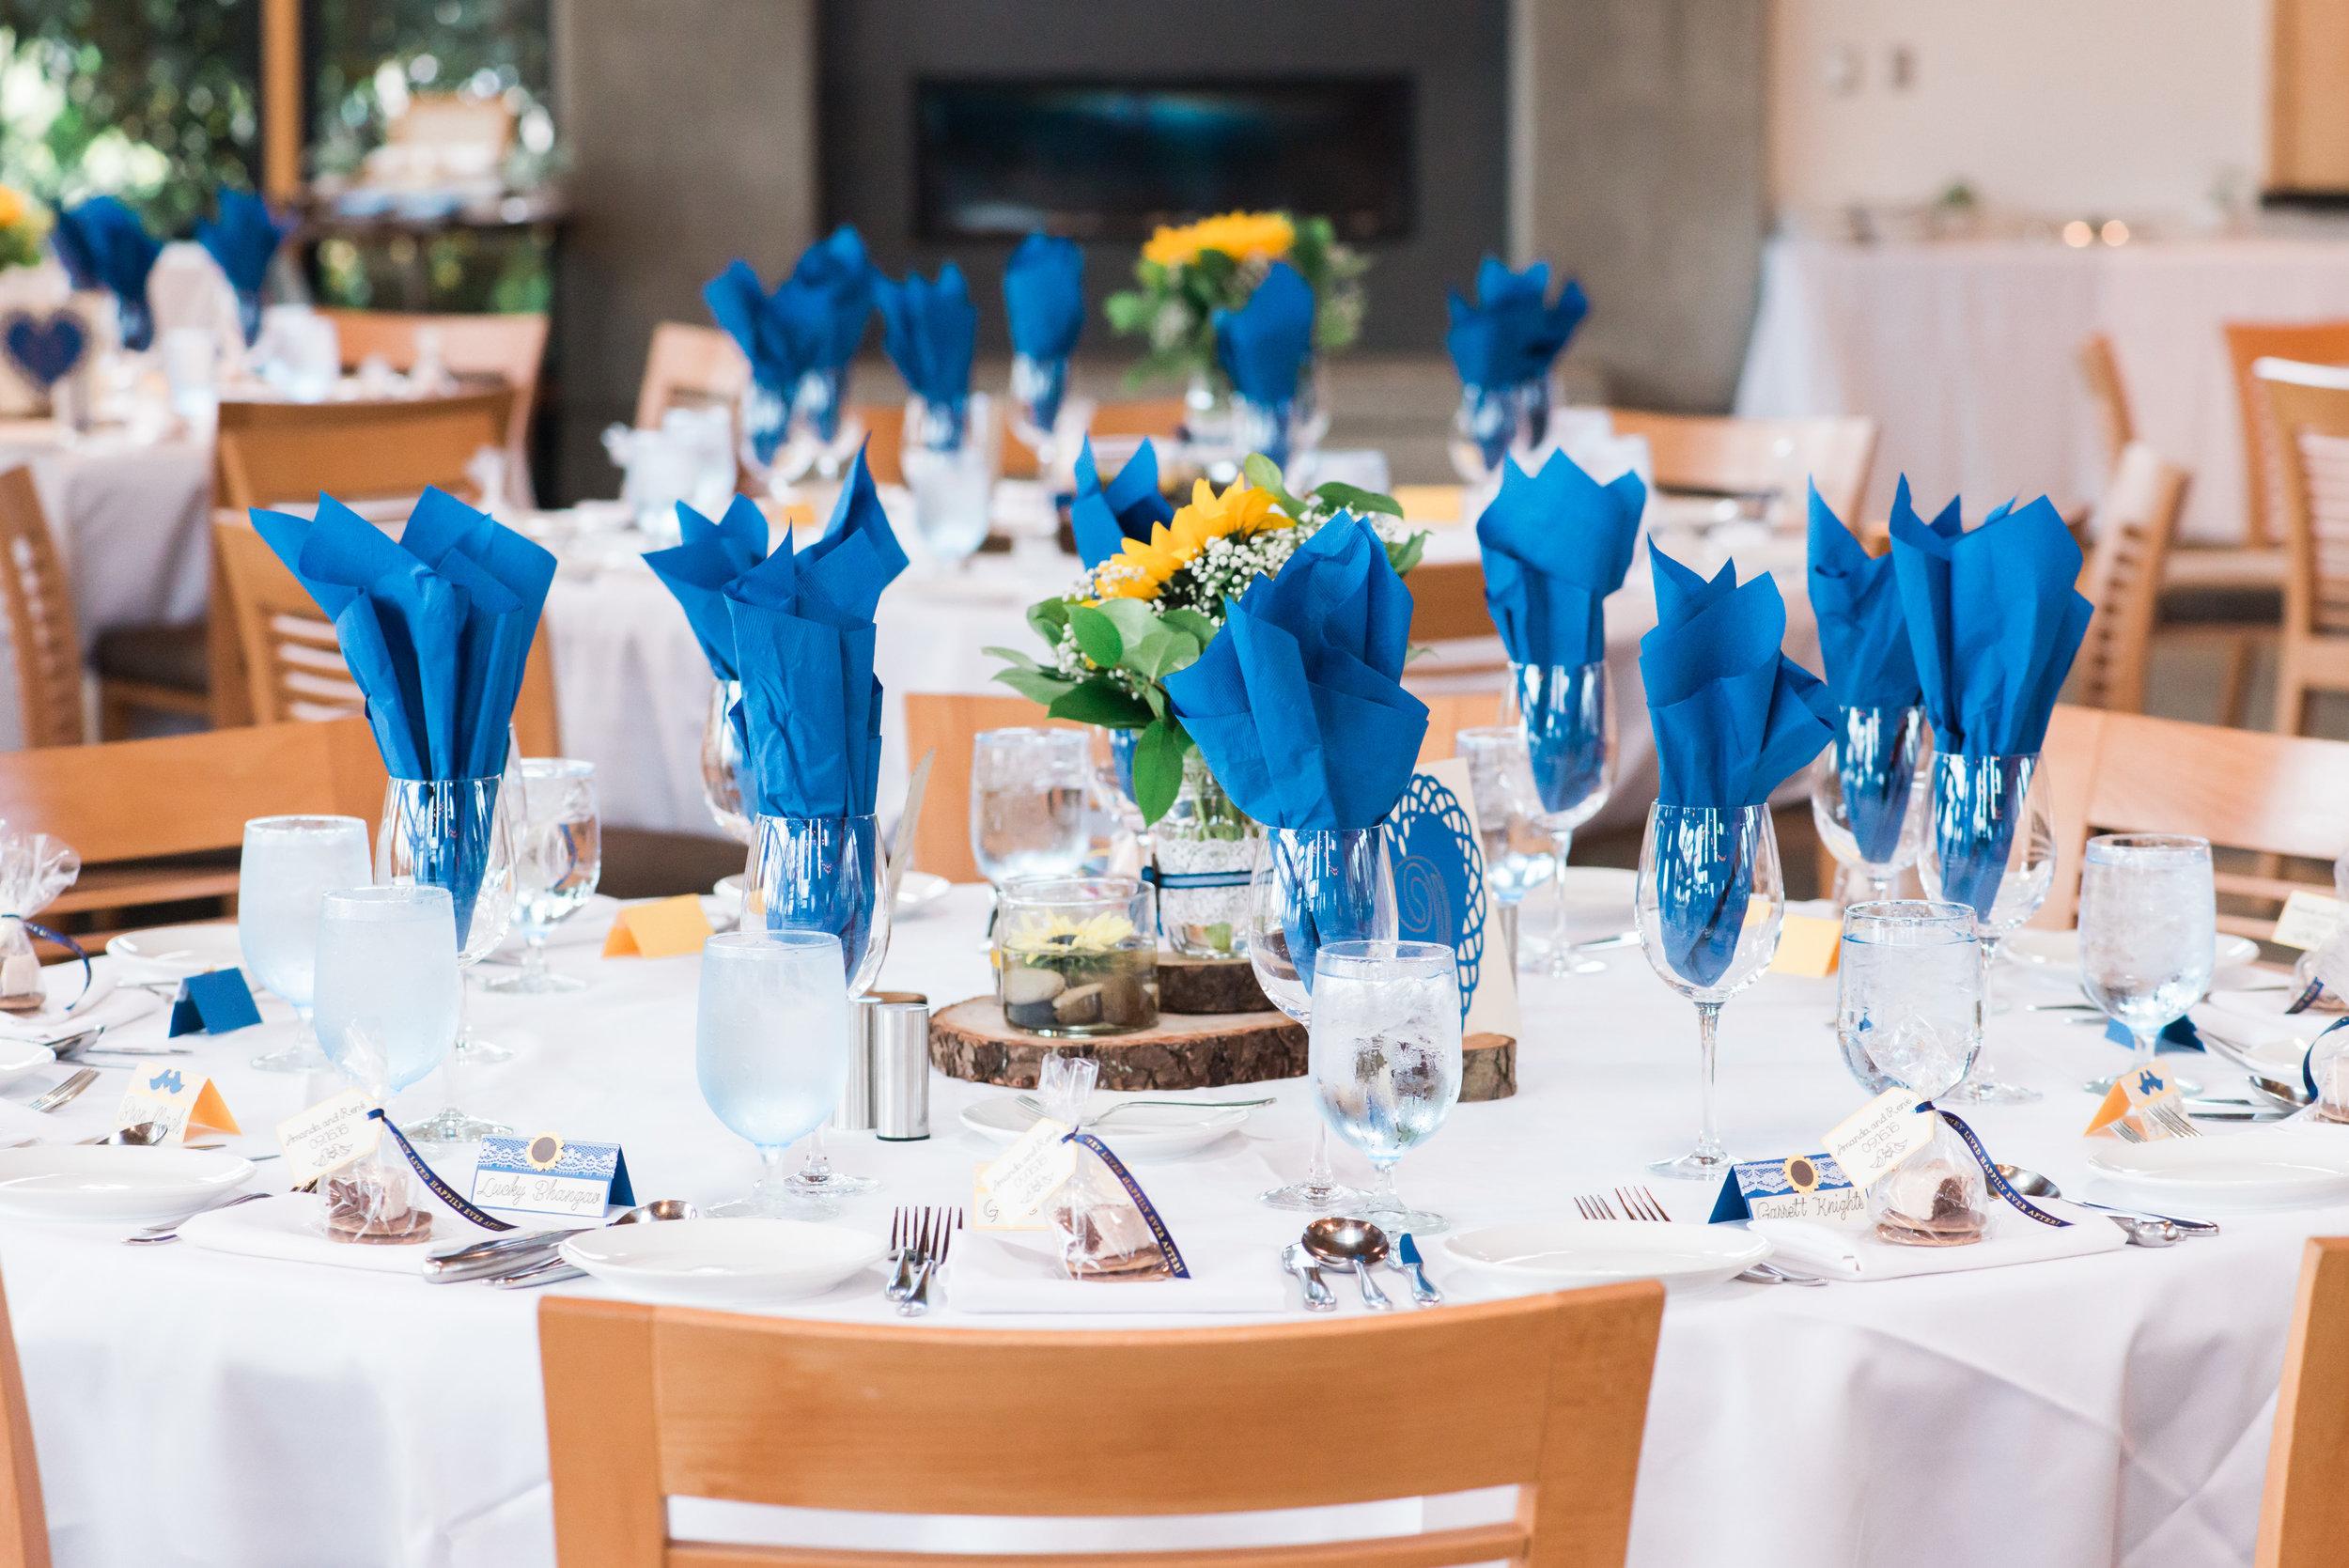 Amanda-rene-wedding-0575-jelger-tanja-photographers.jpg